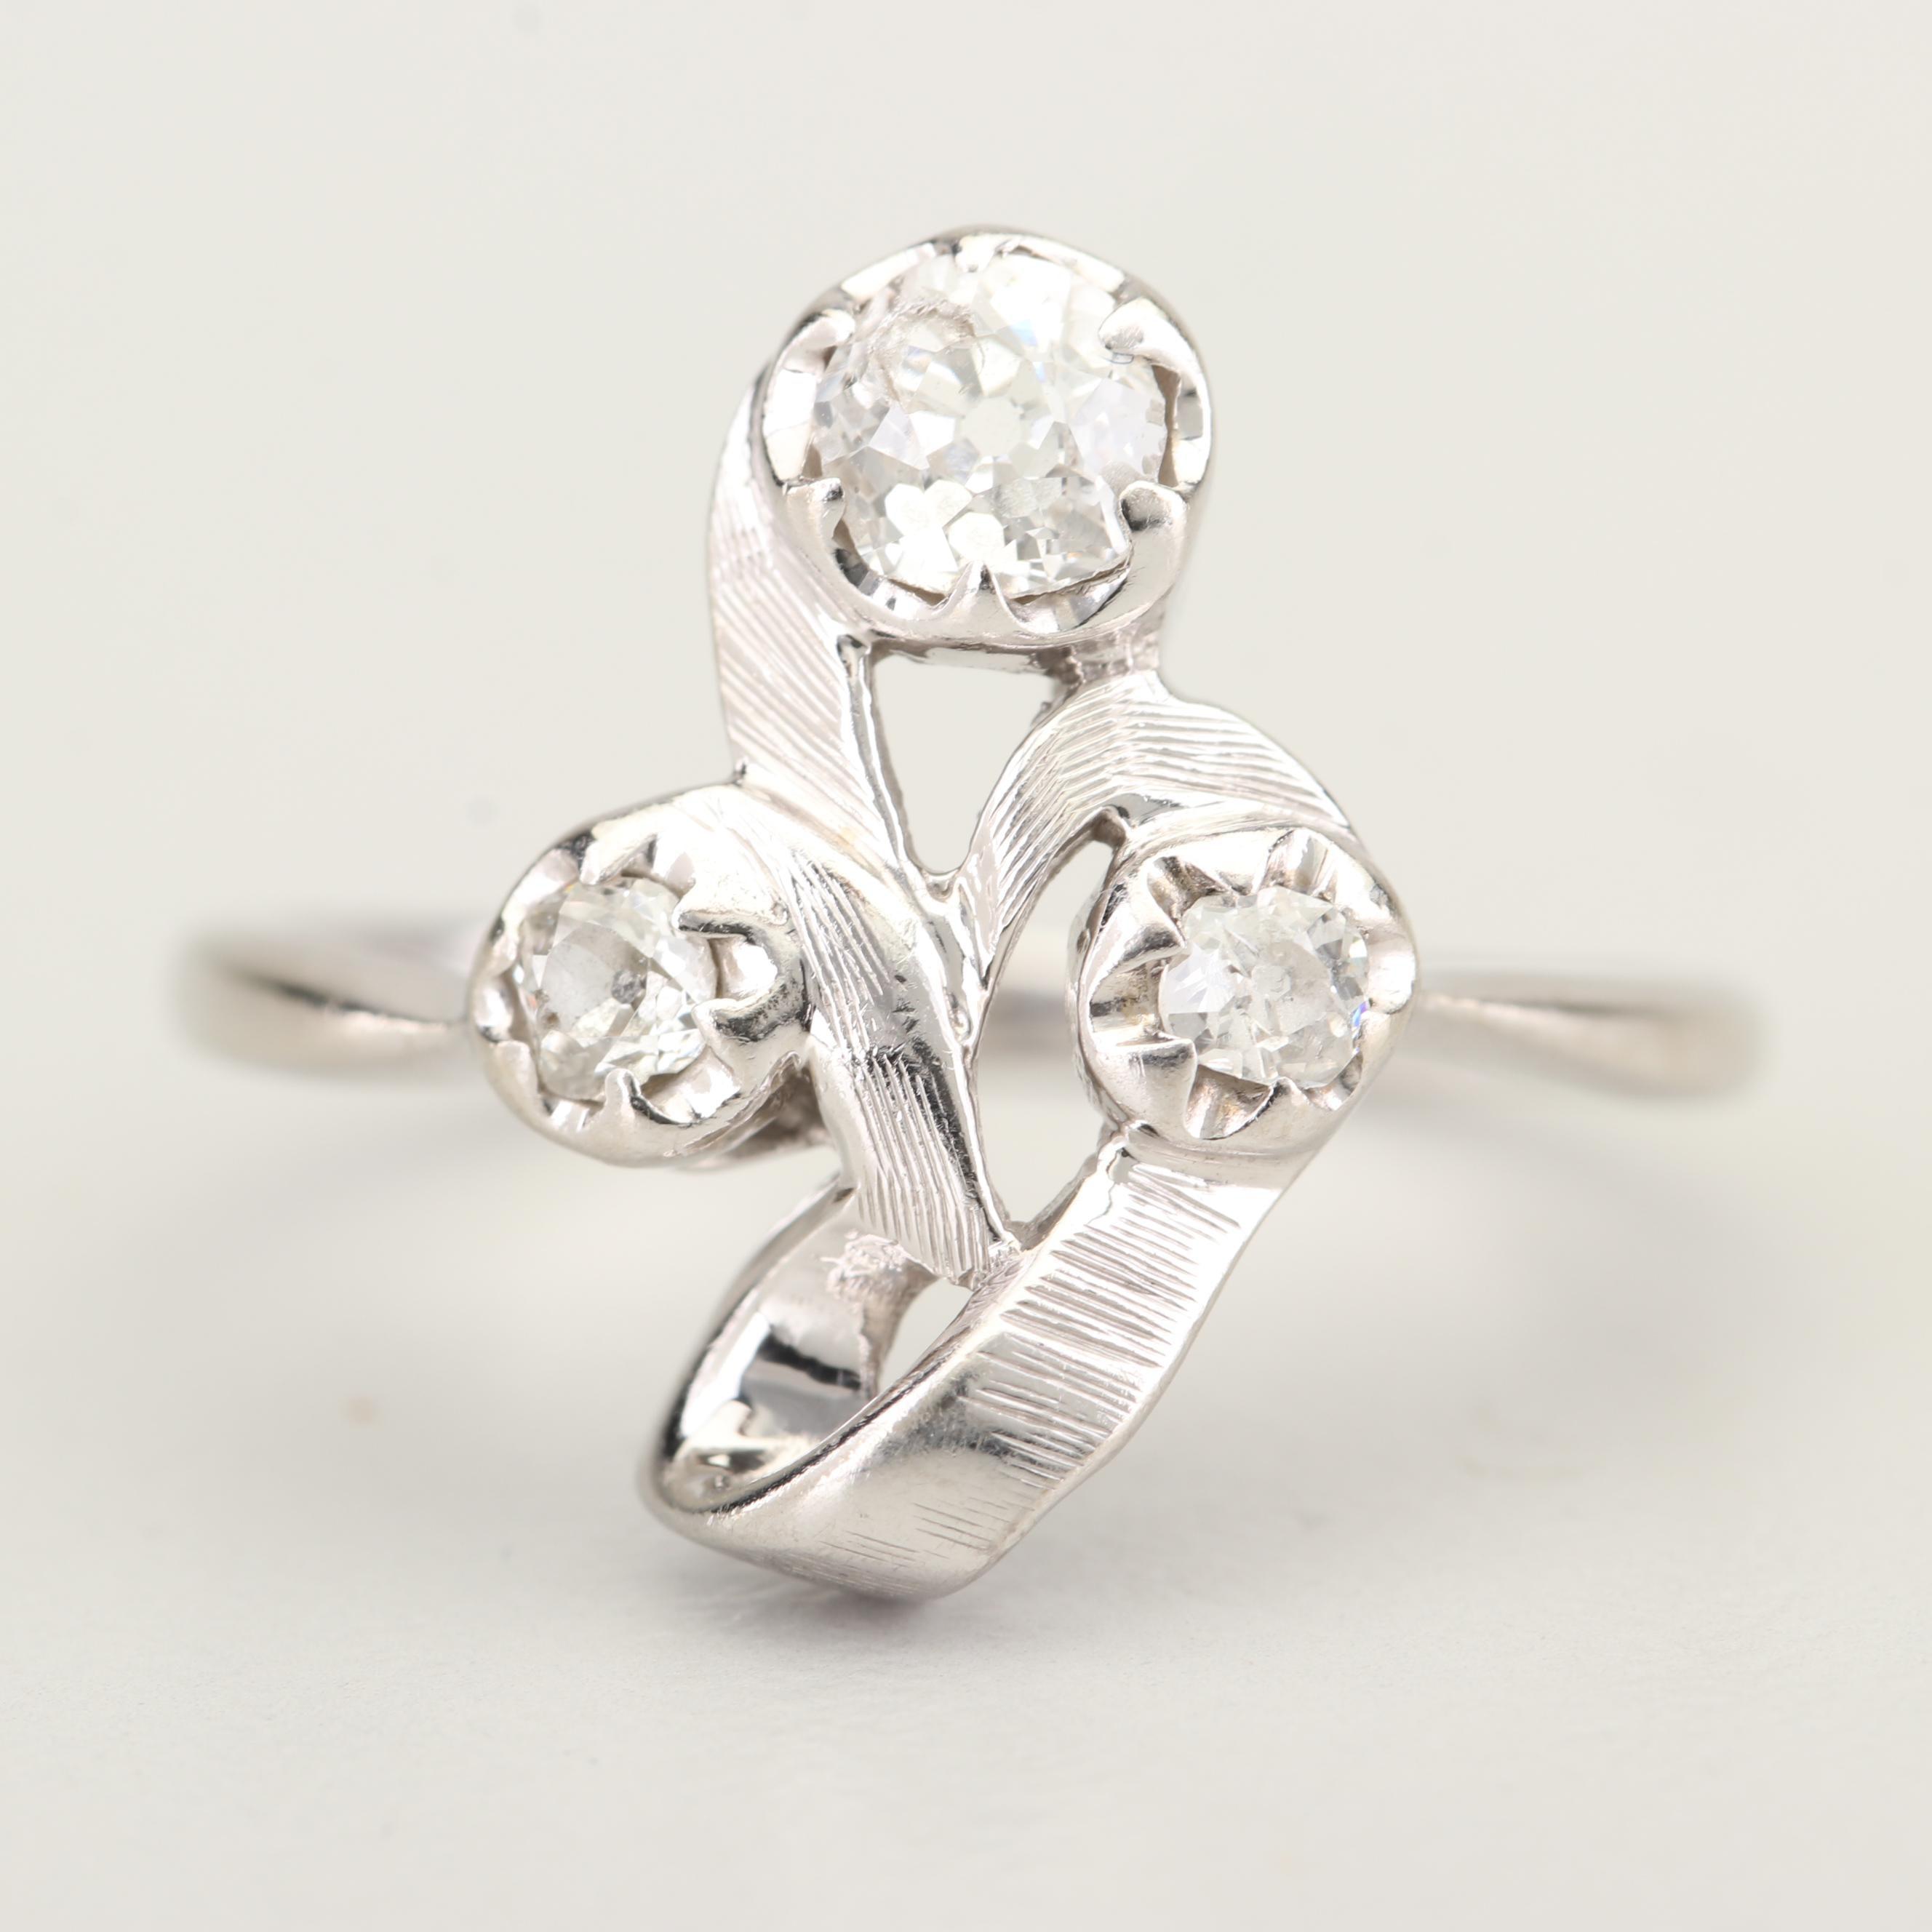 Vintage 14K White Gold Old Mine Cut Diamond Ring